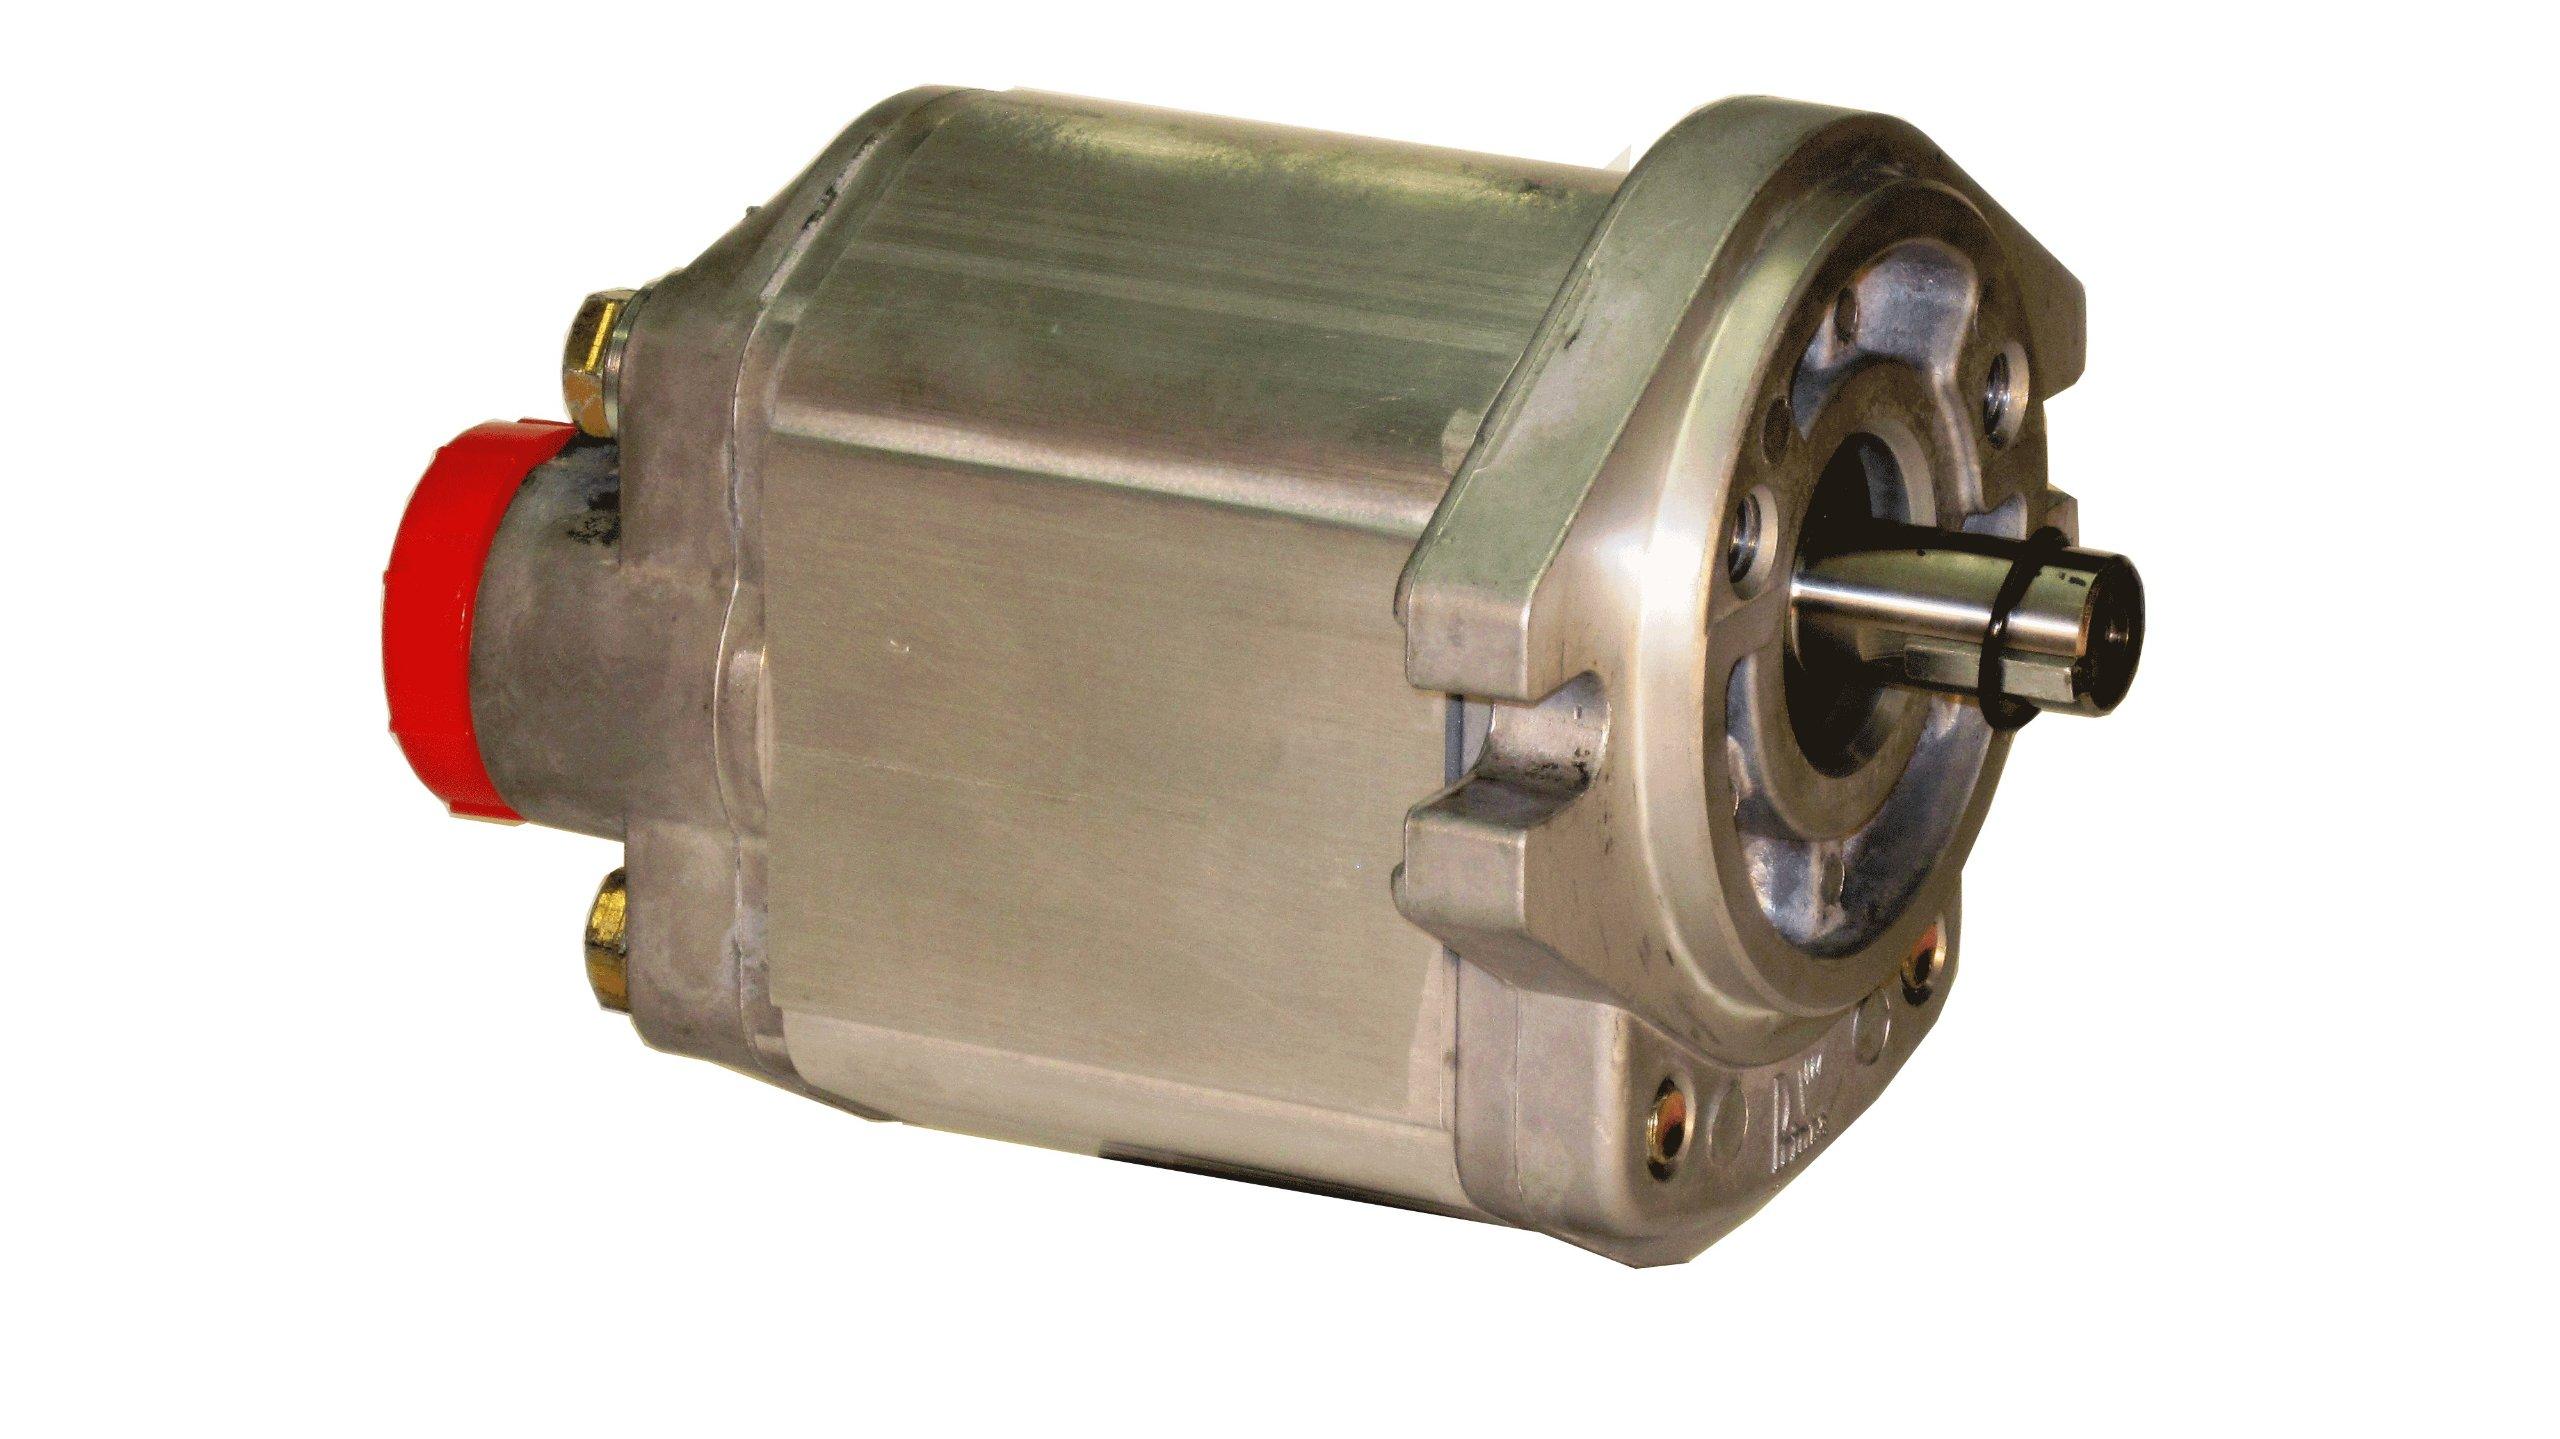 Prince Manufacturing SP20B11D9H2-R Hydraulic Gear Pump, 24.38 HP Motor, 3000 PSI Maximum Pressure, 11.4 GPM Maximum Flow Rate, Clockwise Rotation, Self-Lubricating, SAE A Flange, Aluminum